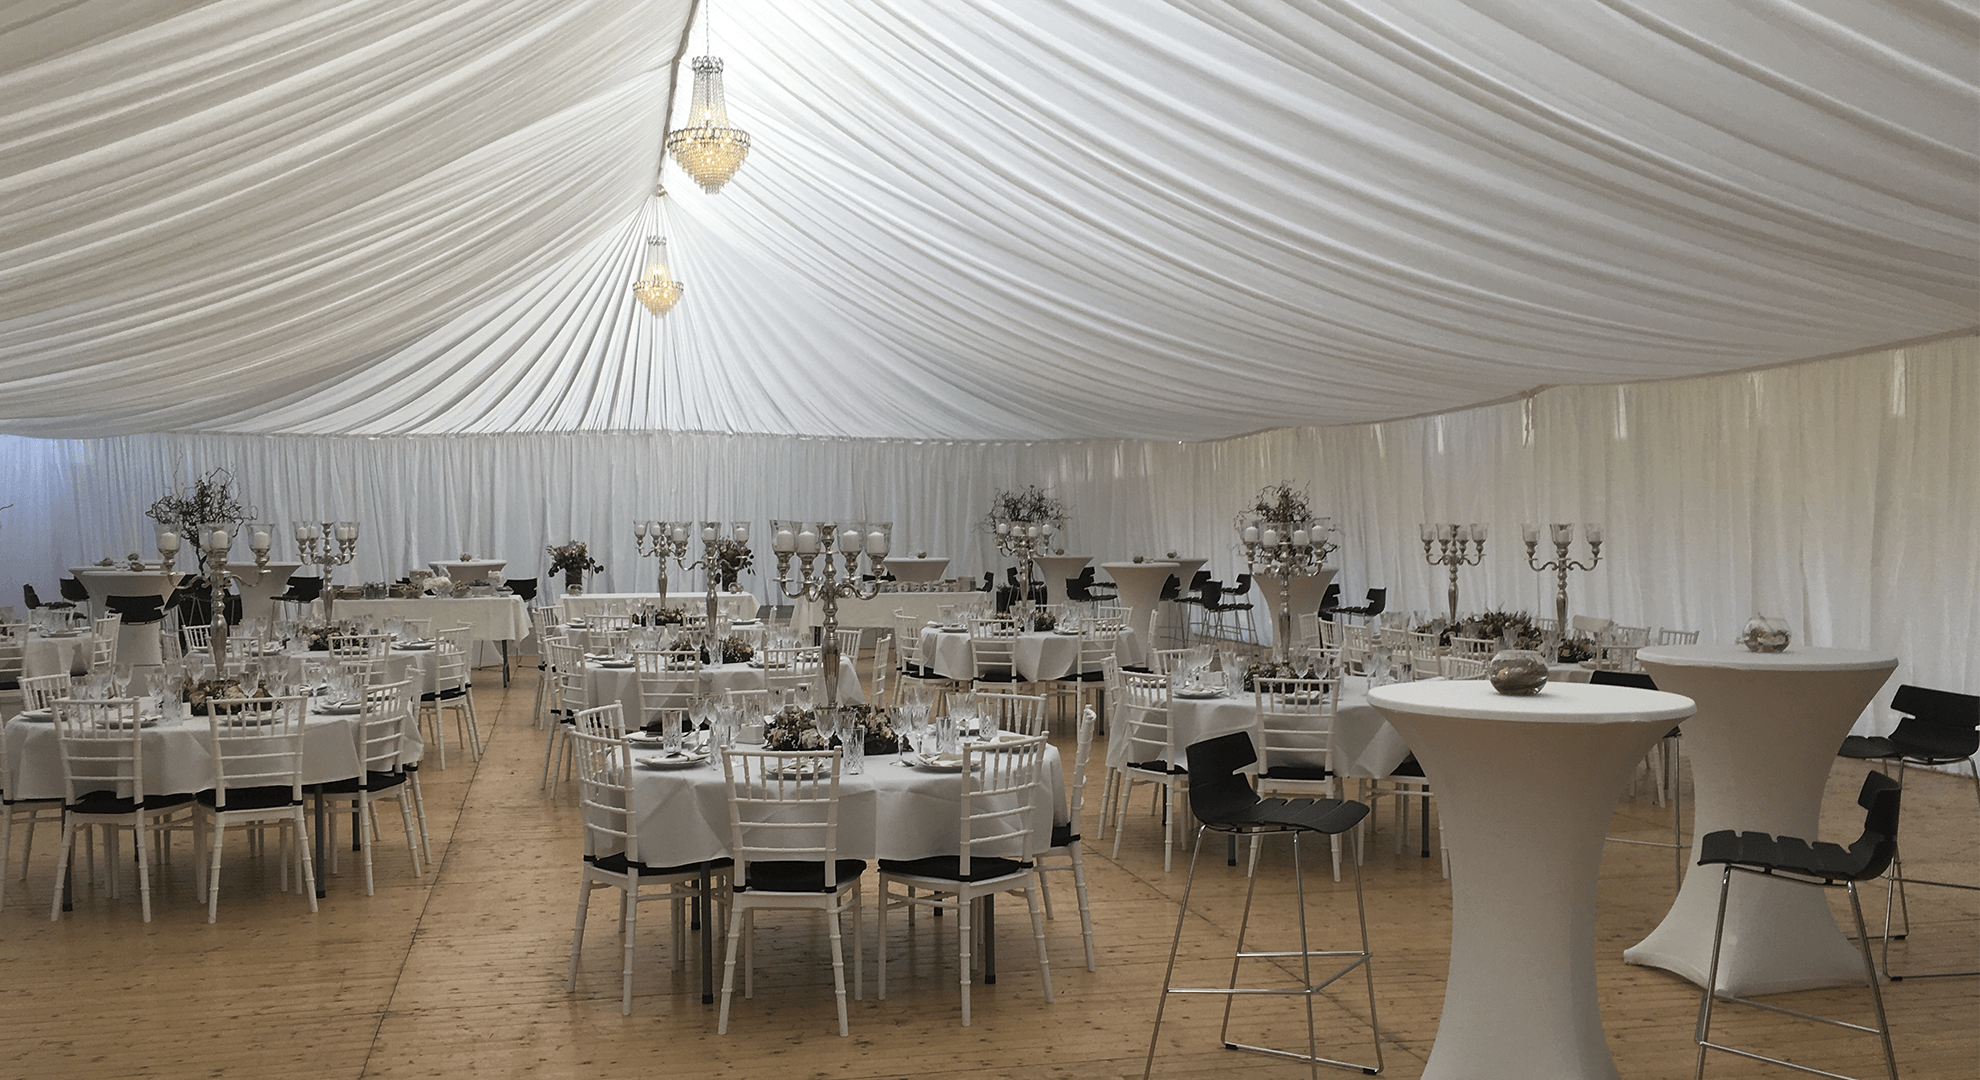 innerline fest i hal bryllup galleri